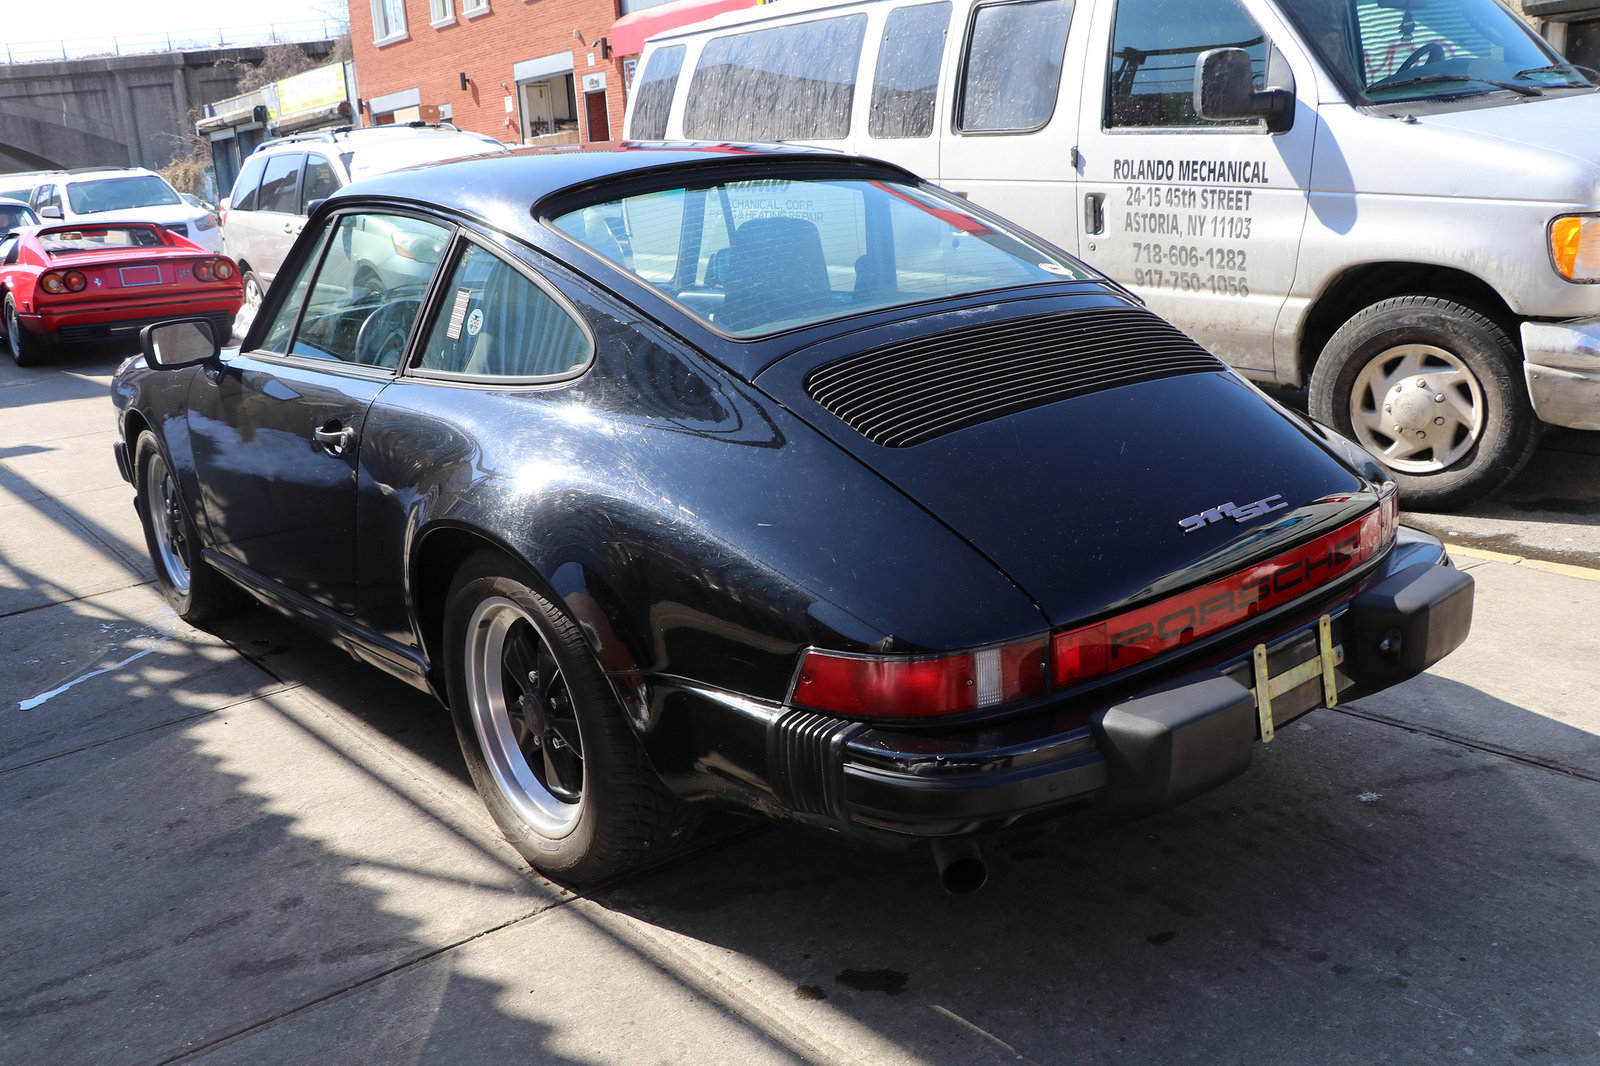 PORSCHE 911SC COUPE 1983 BLACK For Sale (picture 4 of 4)